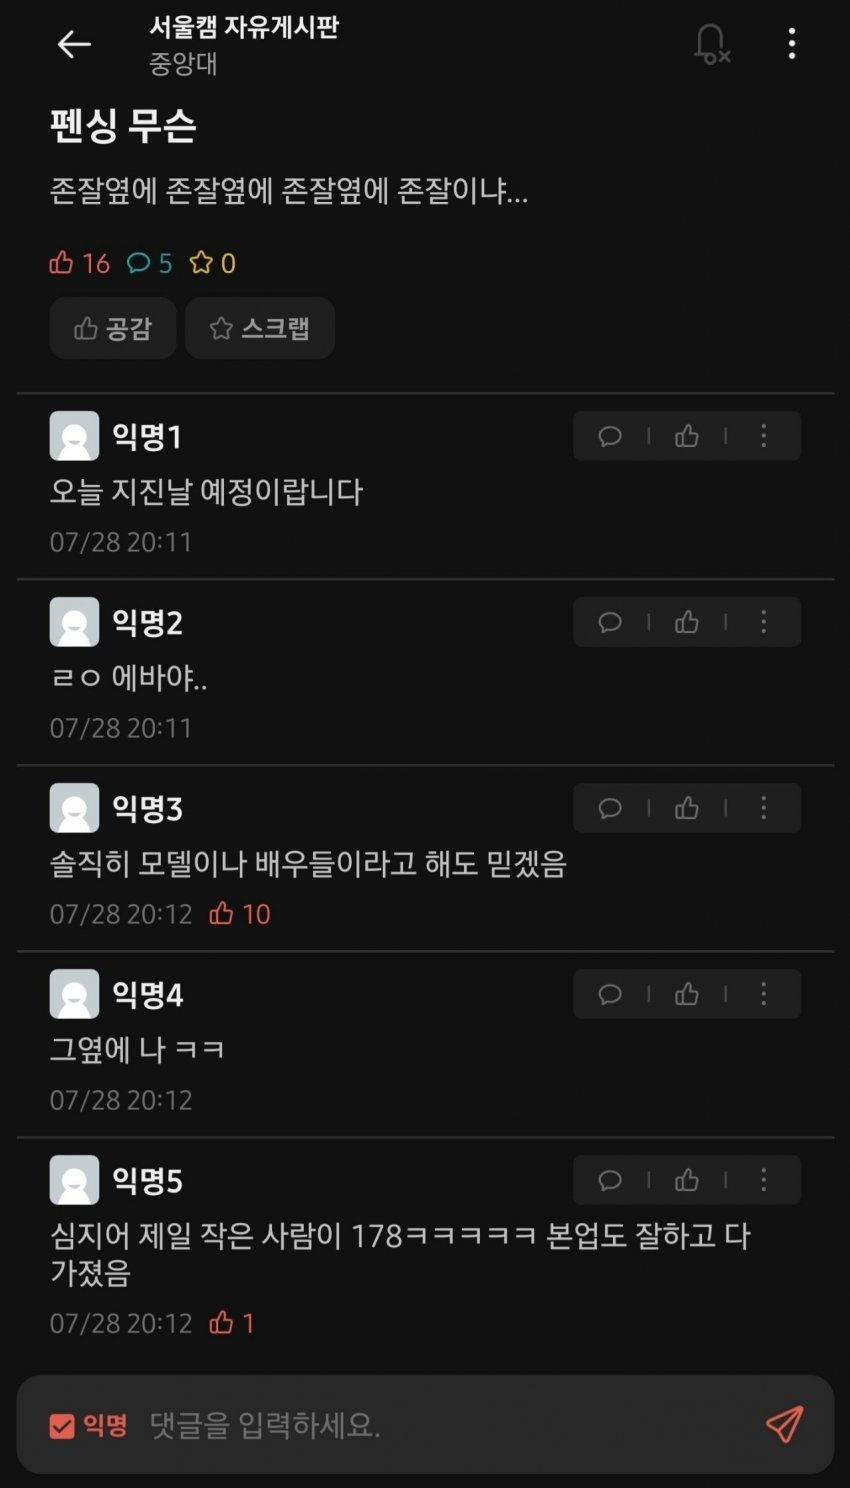 viewimage.php?id=3eb4de21e9d73ab360b8dab04785736f&no=24b0d769e1d32ca73deb86fa11d02831d16706cea37200d6da918279867adc633704be6b274cedfa6cd7629dffee3ce4e17b503b60f775ddb9540beb1eb335ff7e7fb468365565dda761c2ff73fa7749a3bc985a0f1f2c100ef9fcc2c9a9447b331910079785bbb16132b9572dc1